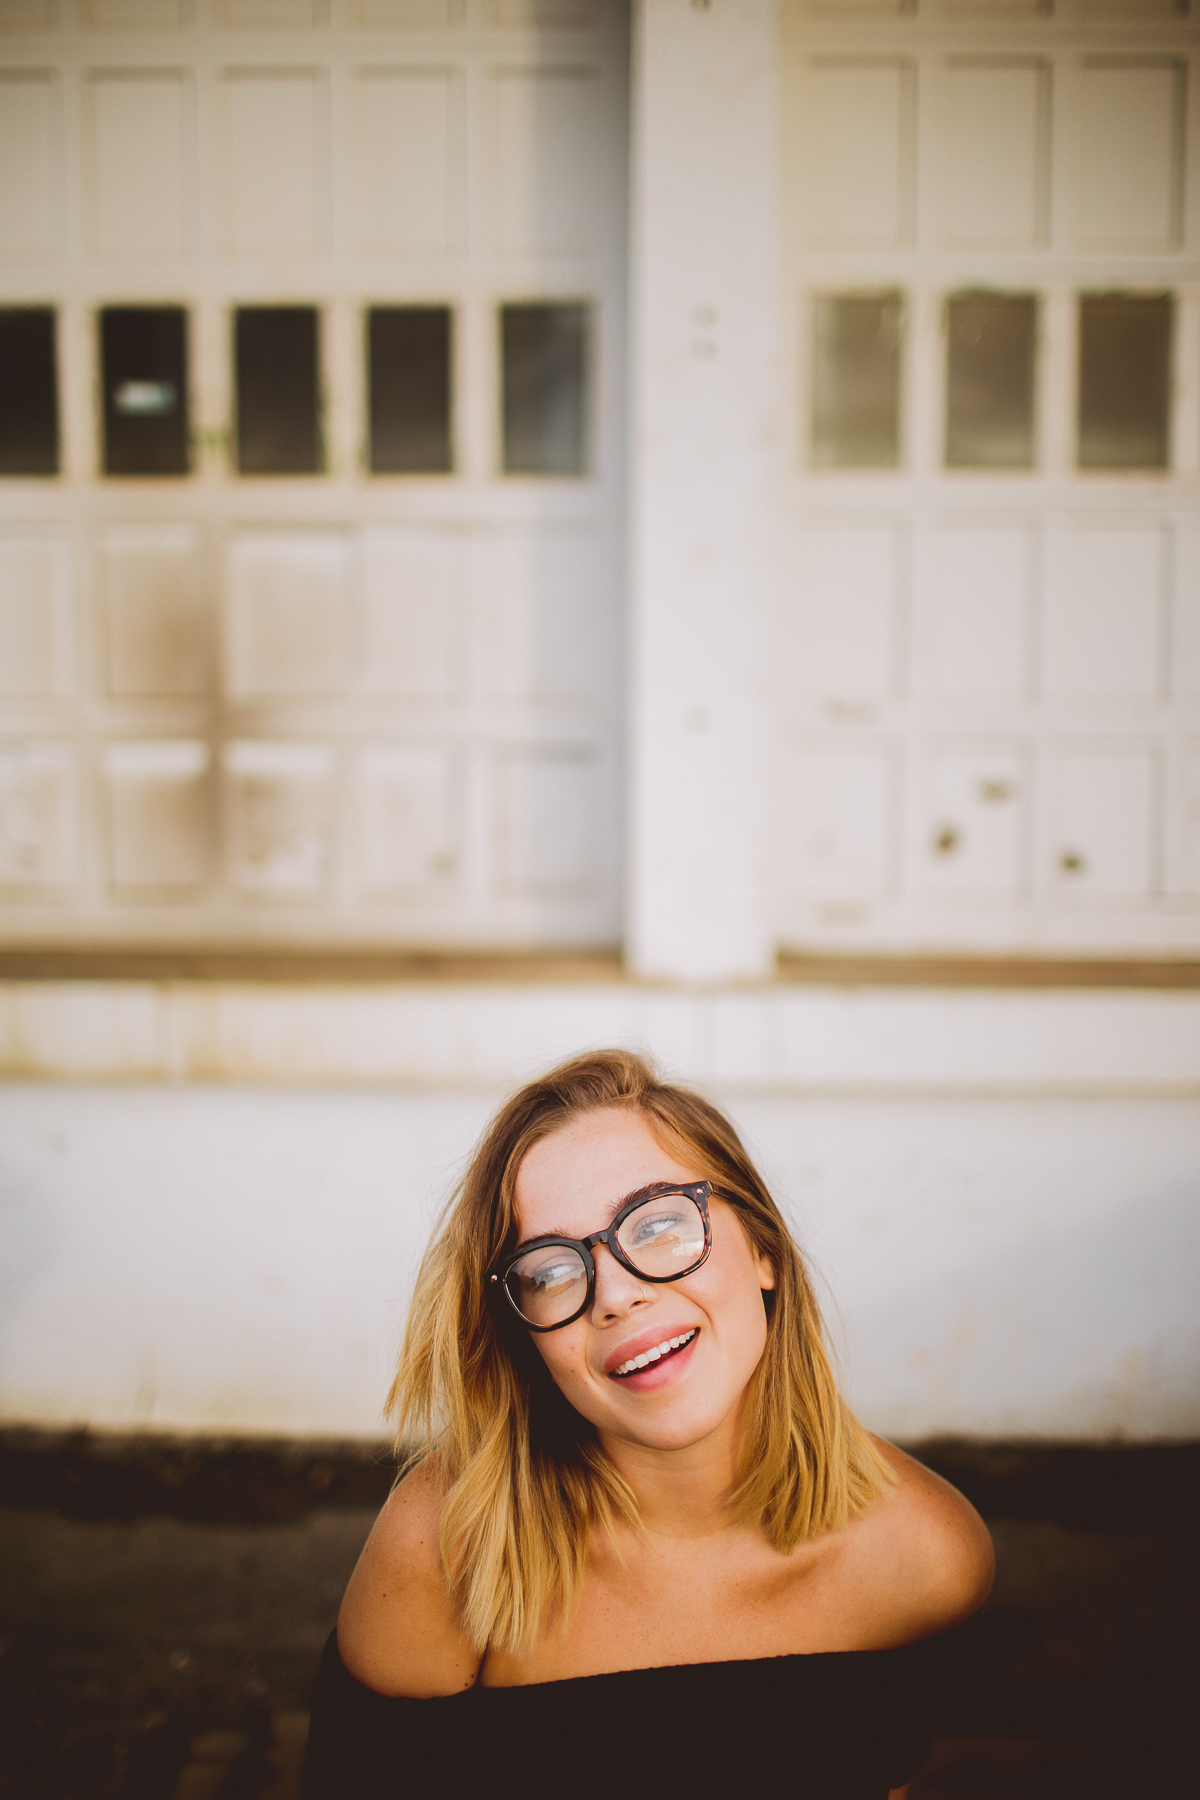 kayleigh-kelley-raye-lifestyle-photographer-10.jpg